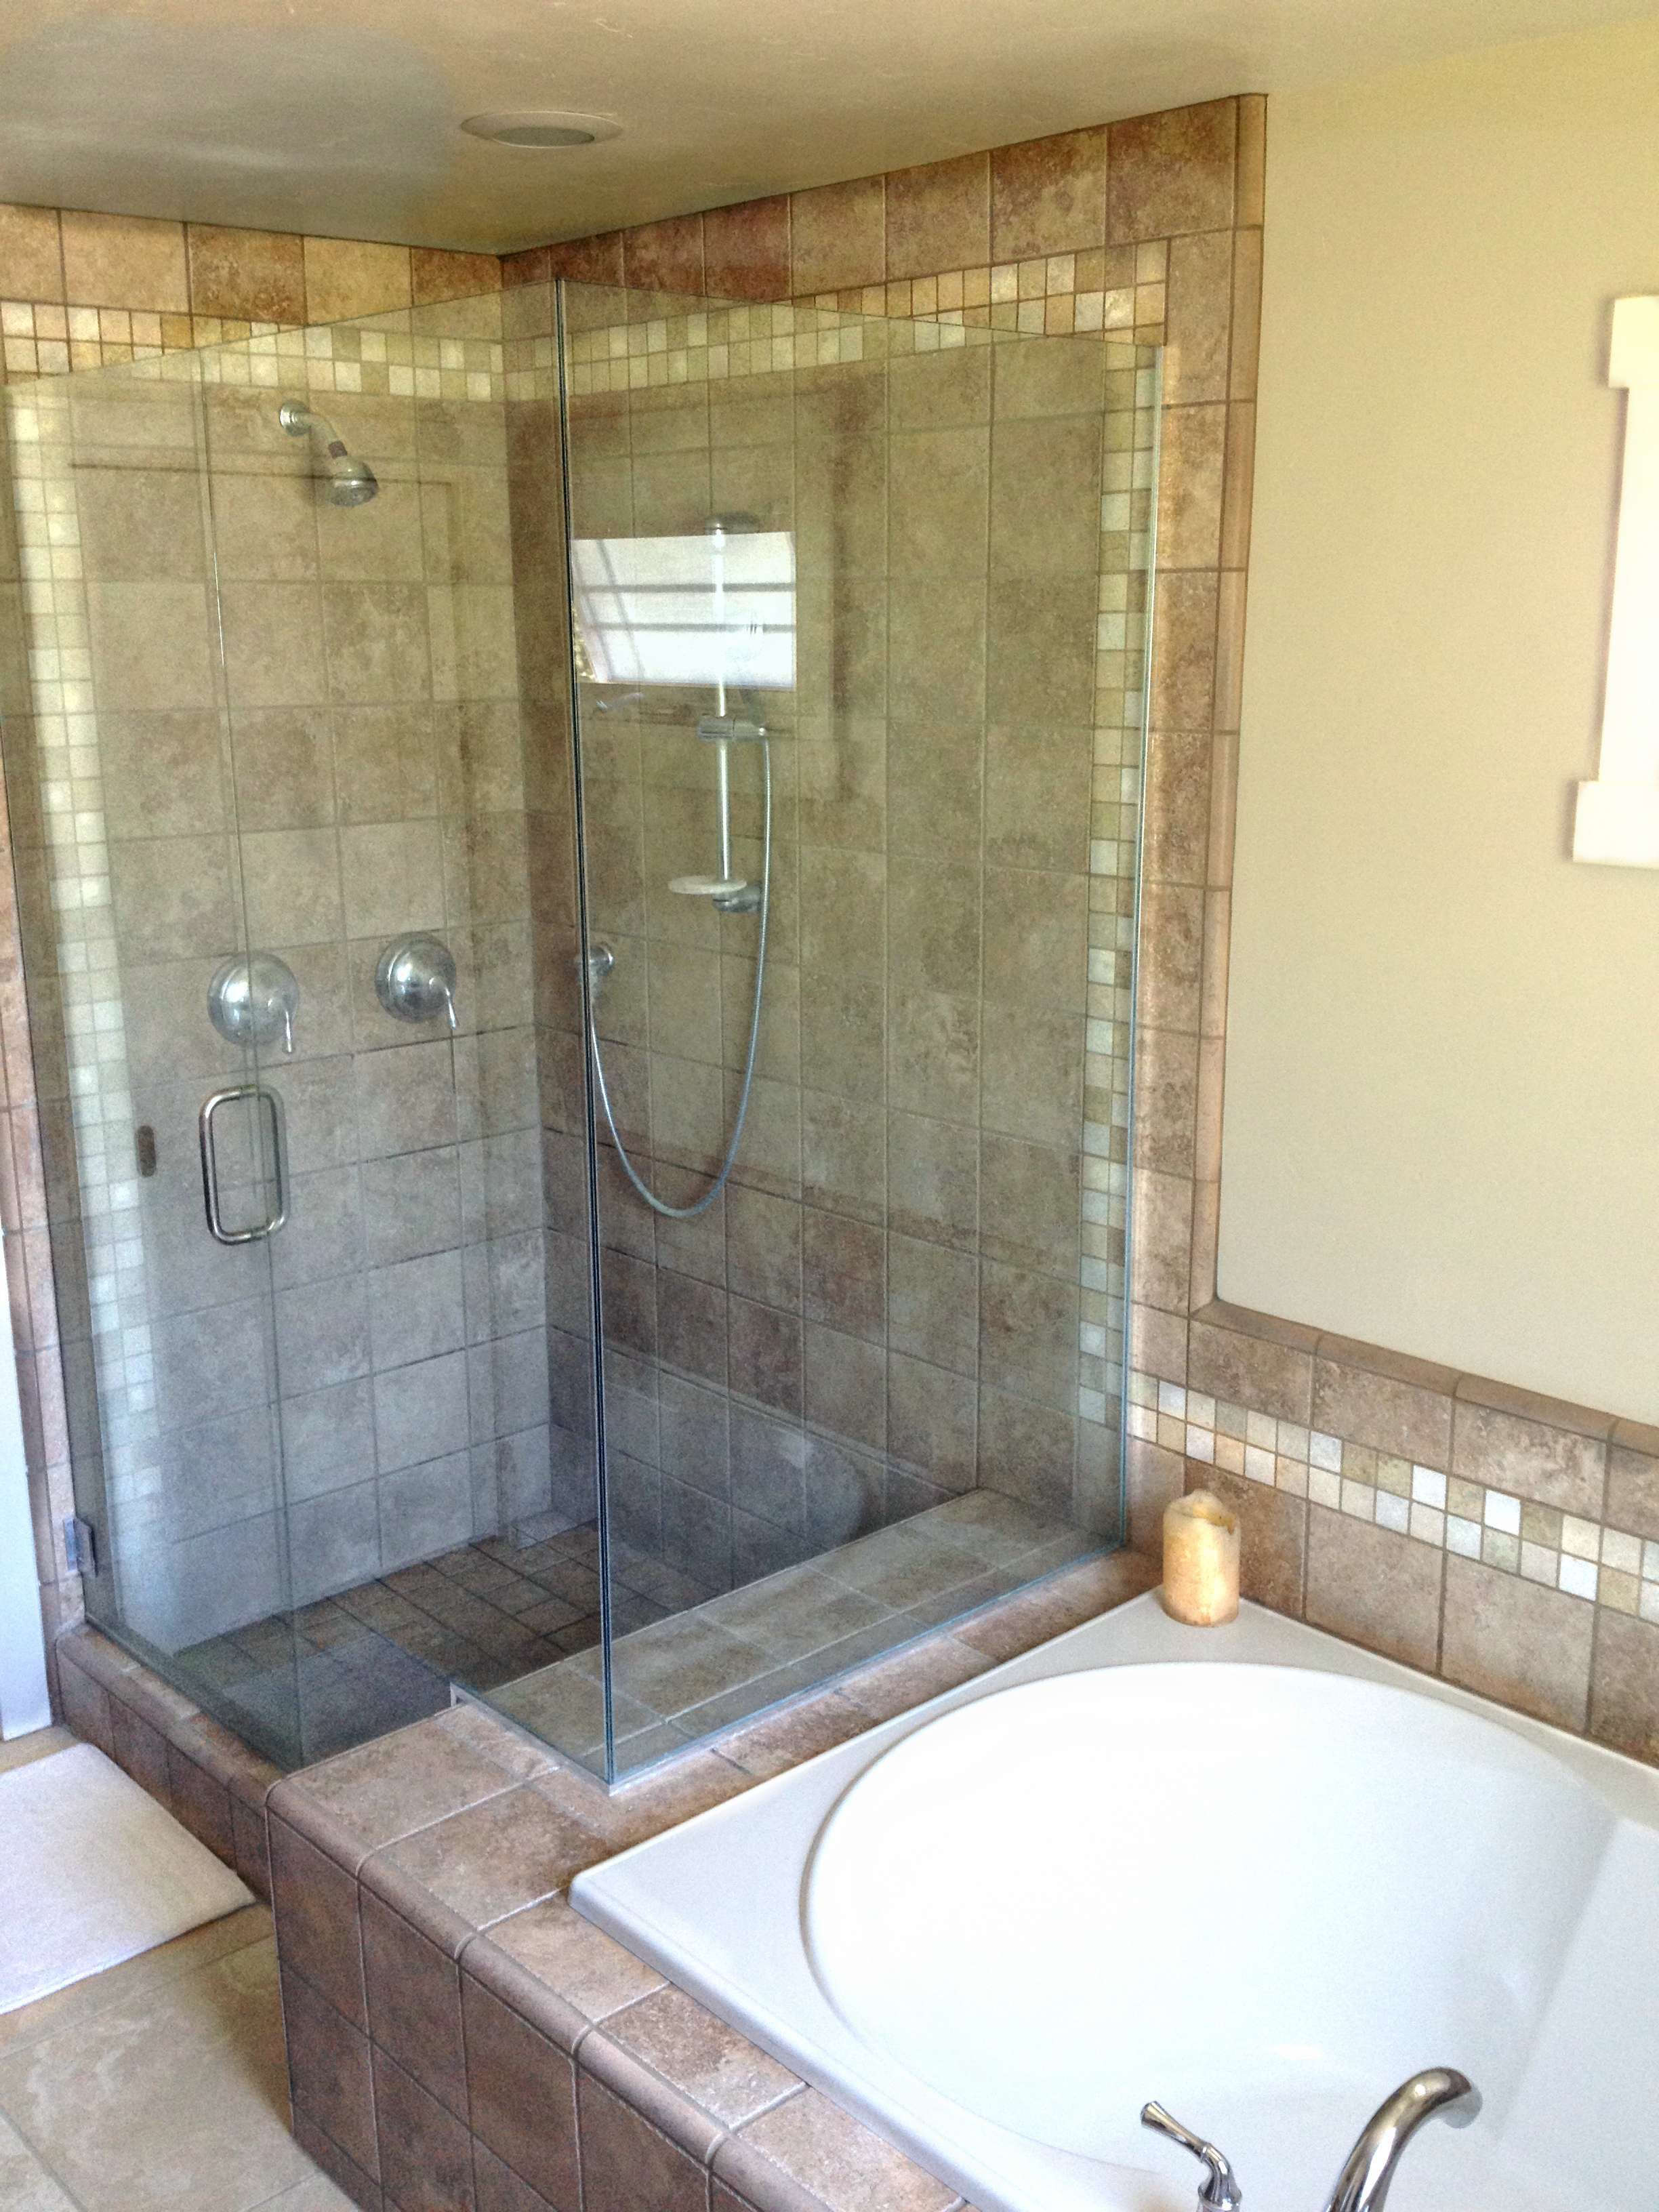 Bath And Shower Remodel San Jose CA Spa Inspired Master Bath - Remodel bathroom san jose